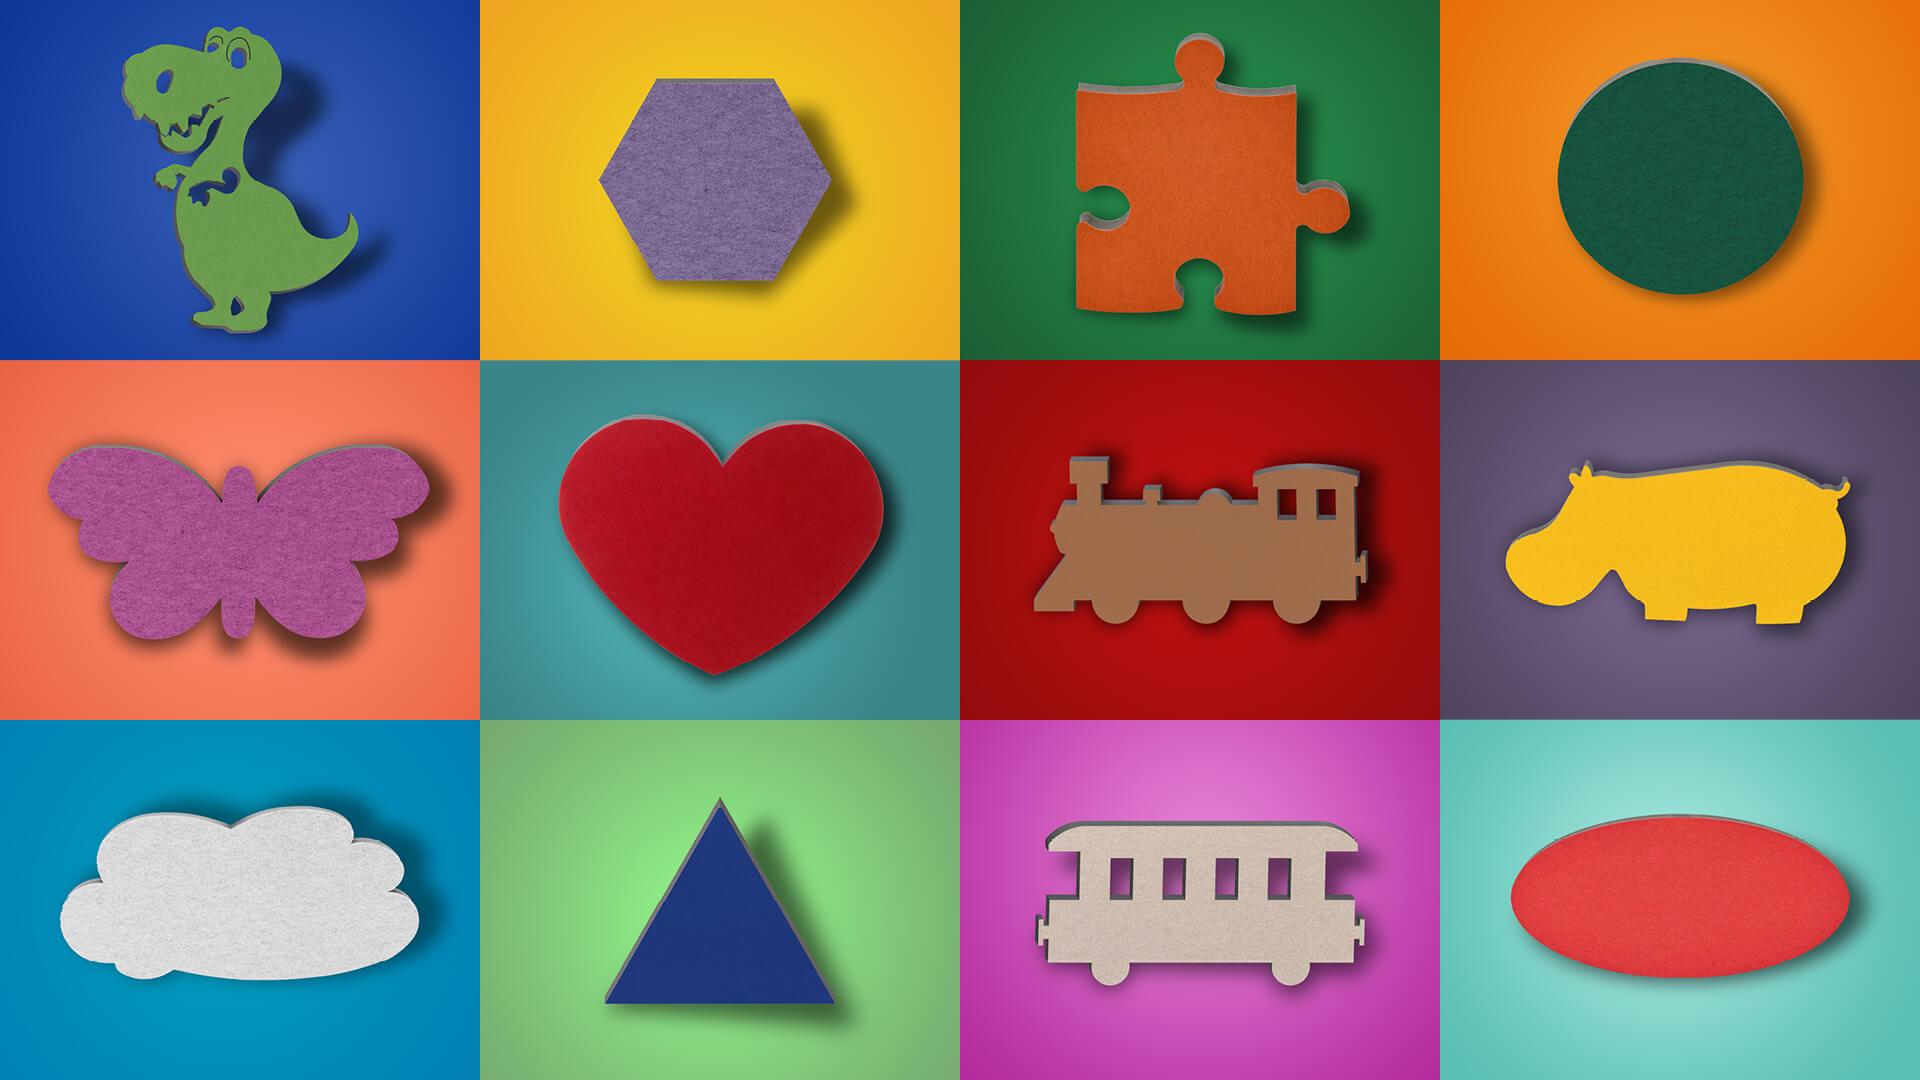 aixFOAM Motiv-Schallabsorber - Schallabsorber in farbigen Motiven